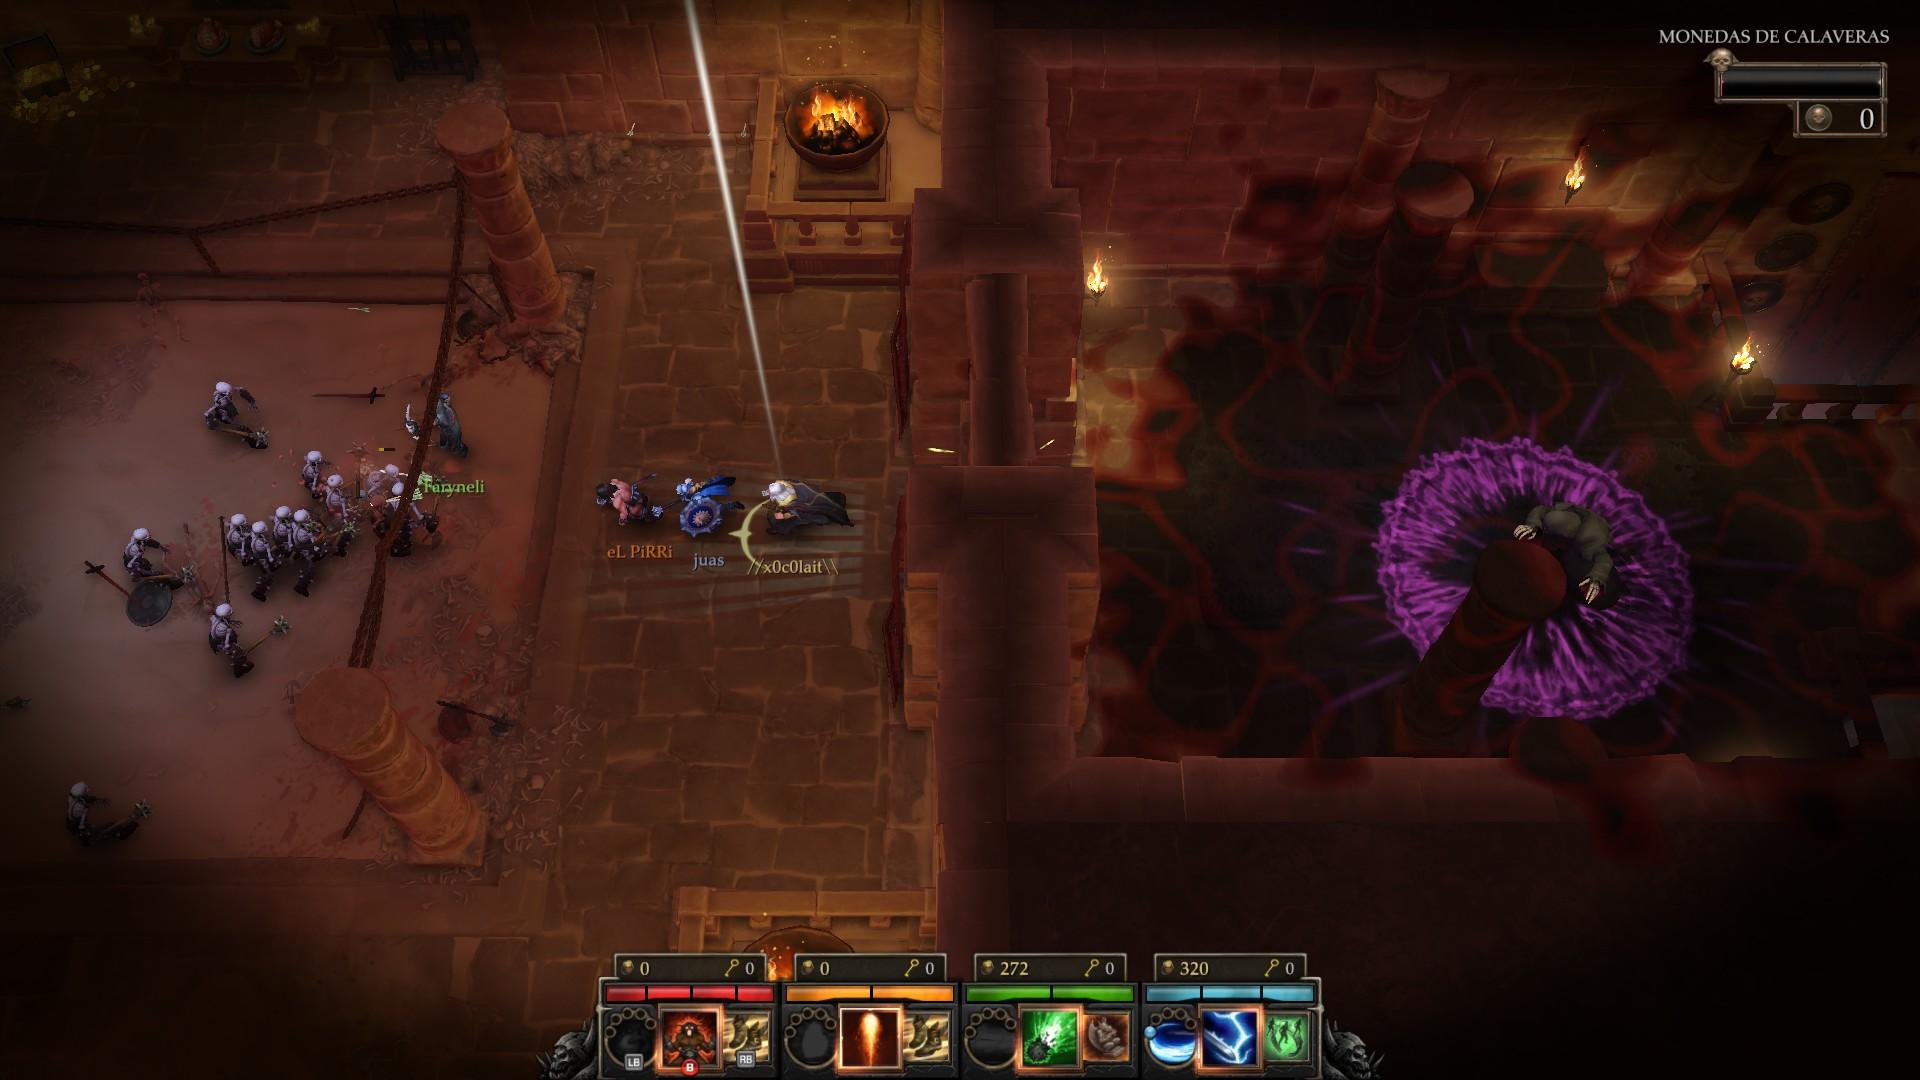 Gauntlet Slayer Edition gameplay